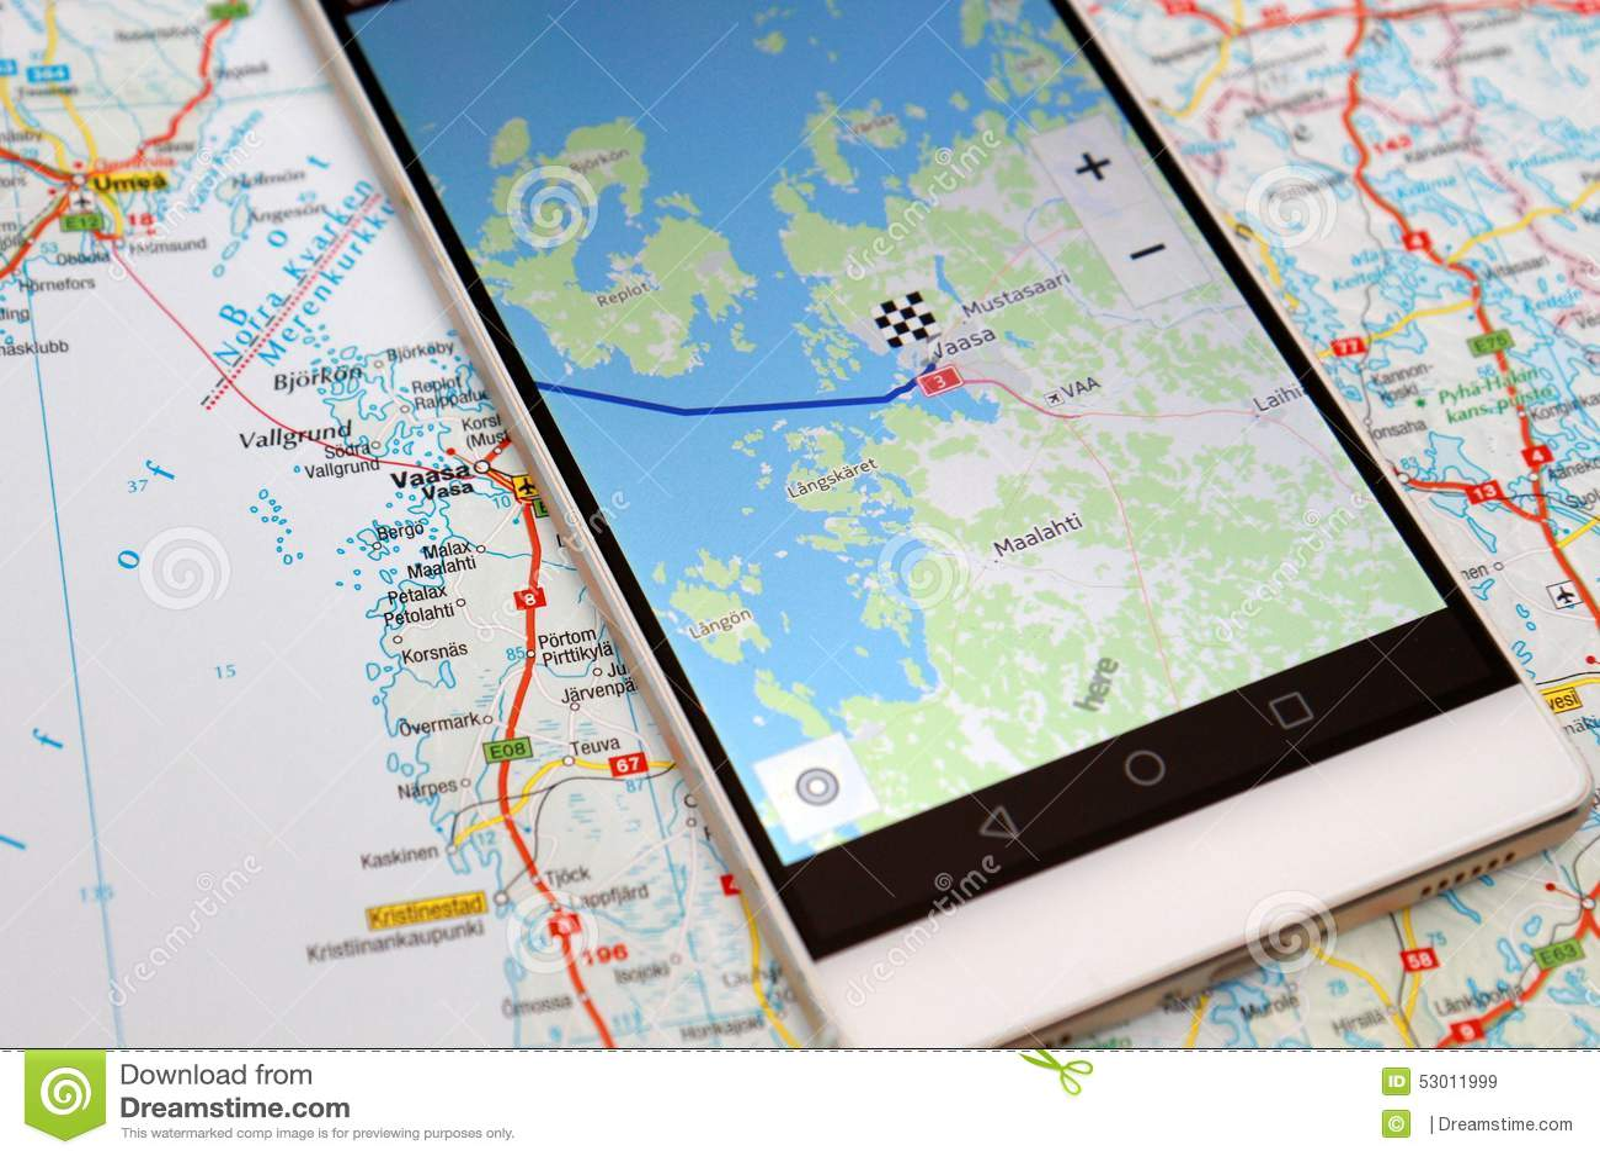 GPS navigation map smartphone